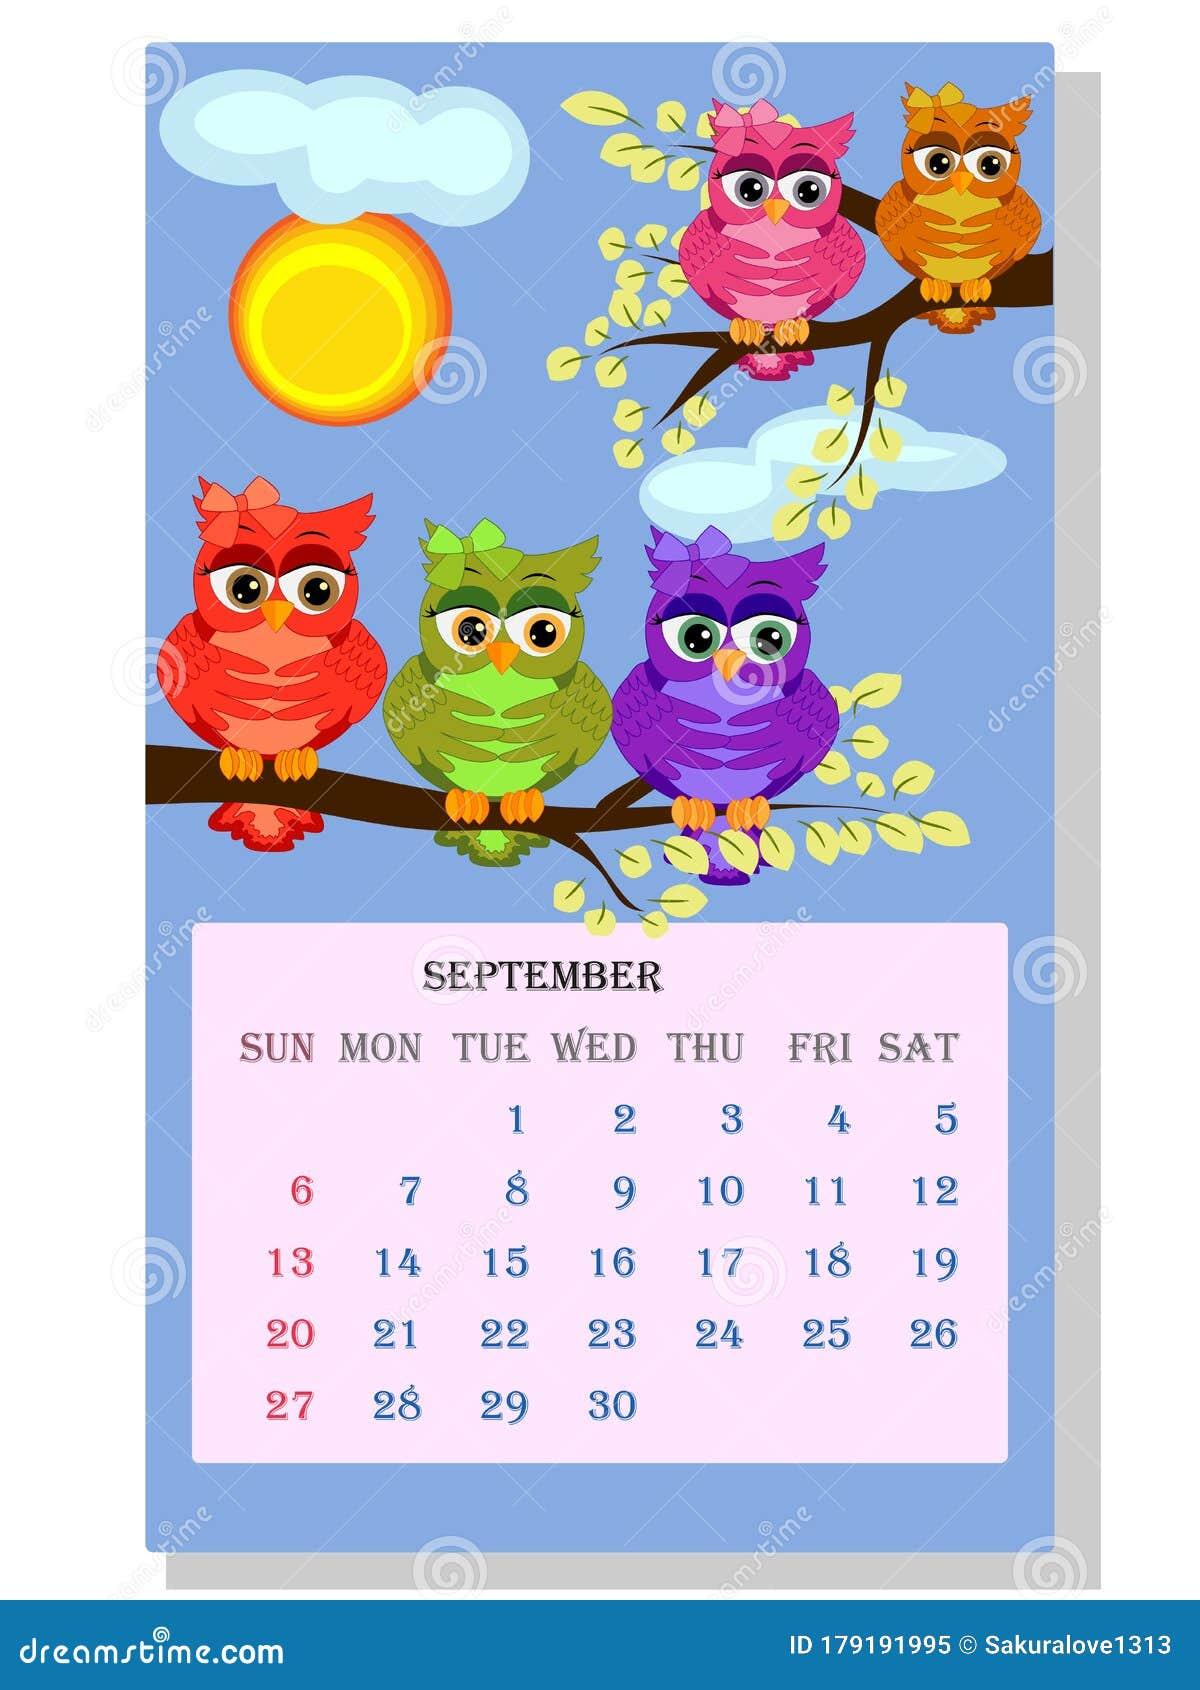 Uw 2021-2022 Calendar Calendar 2021. Cute Calendar With Funny Cartoon Owls Stock